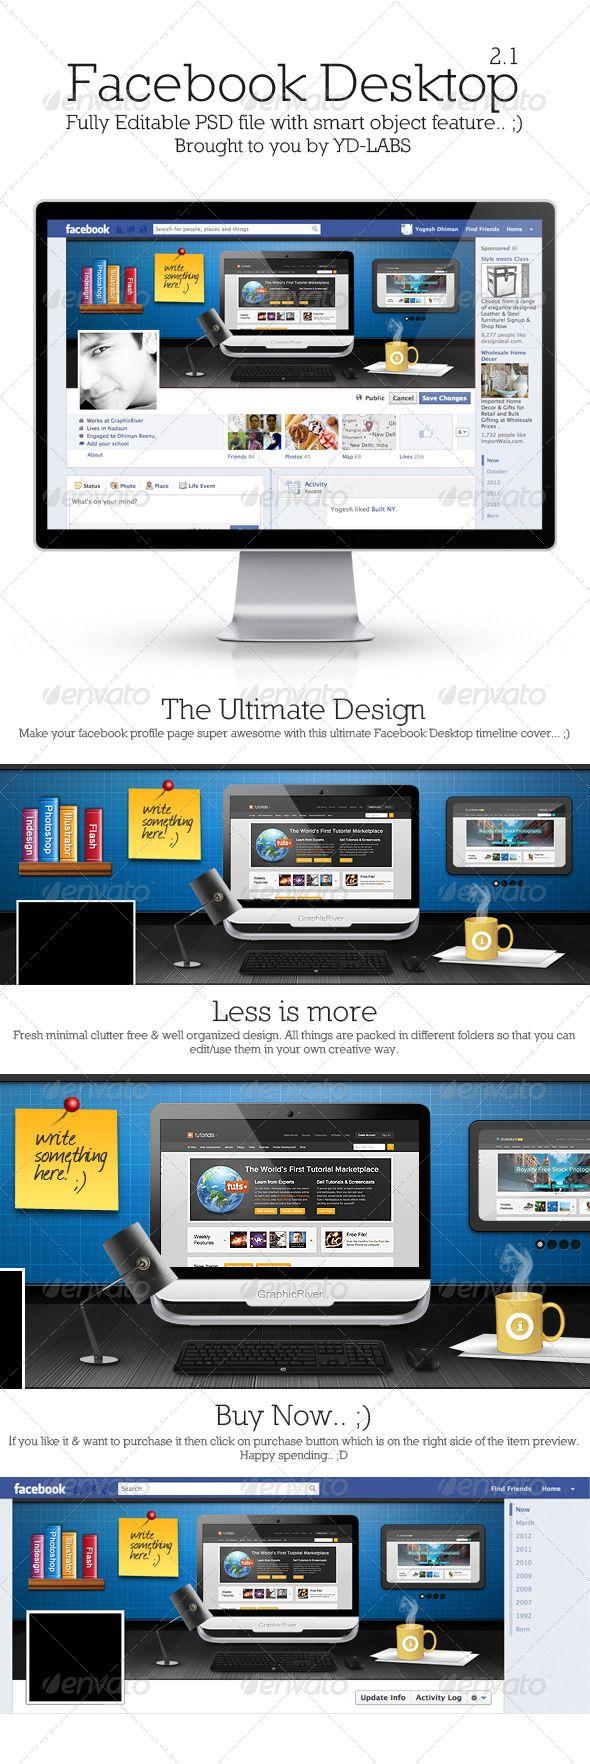 FB Desktop 2.1 — Photoshop PSD #psd #web elements • Available here → https://graphicriver.net/item/fb-desktop-21/3375214?ref=pxcr